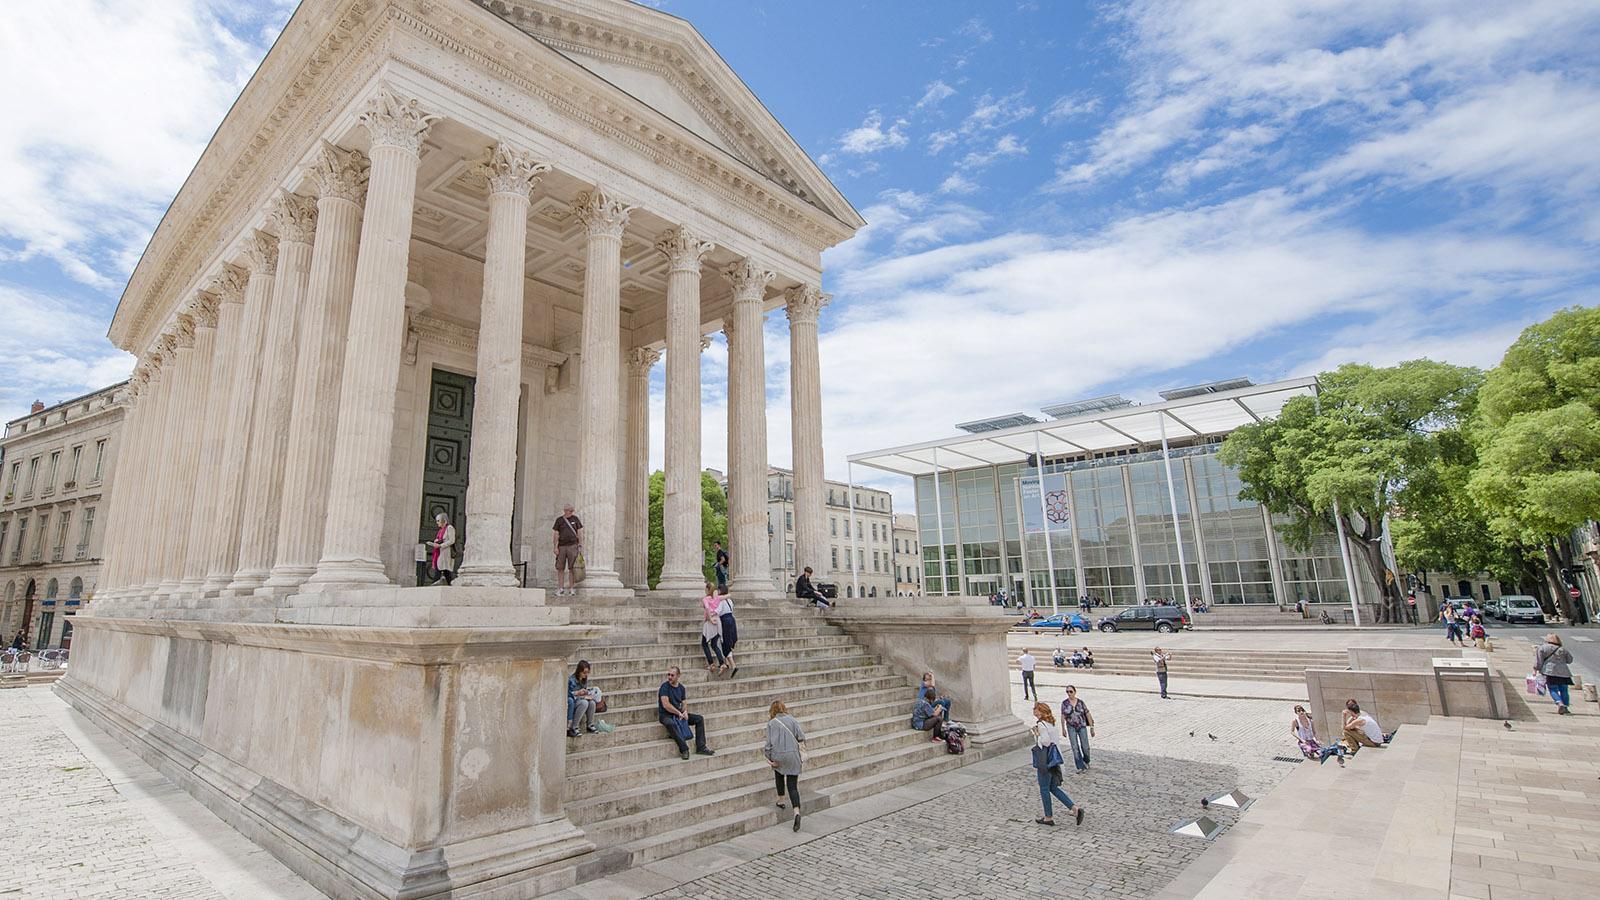 Nîmes: Spannungsvoller Kontrast: die Maison Carrée (l.) und das Carré d'Art (r.). Foto. Hilke Maunder